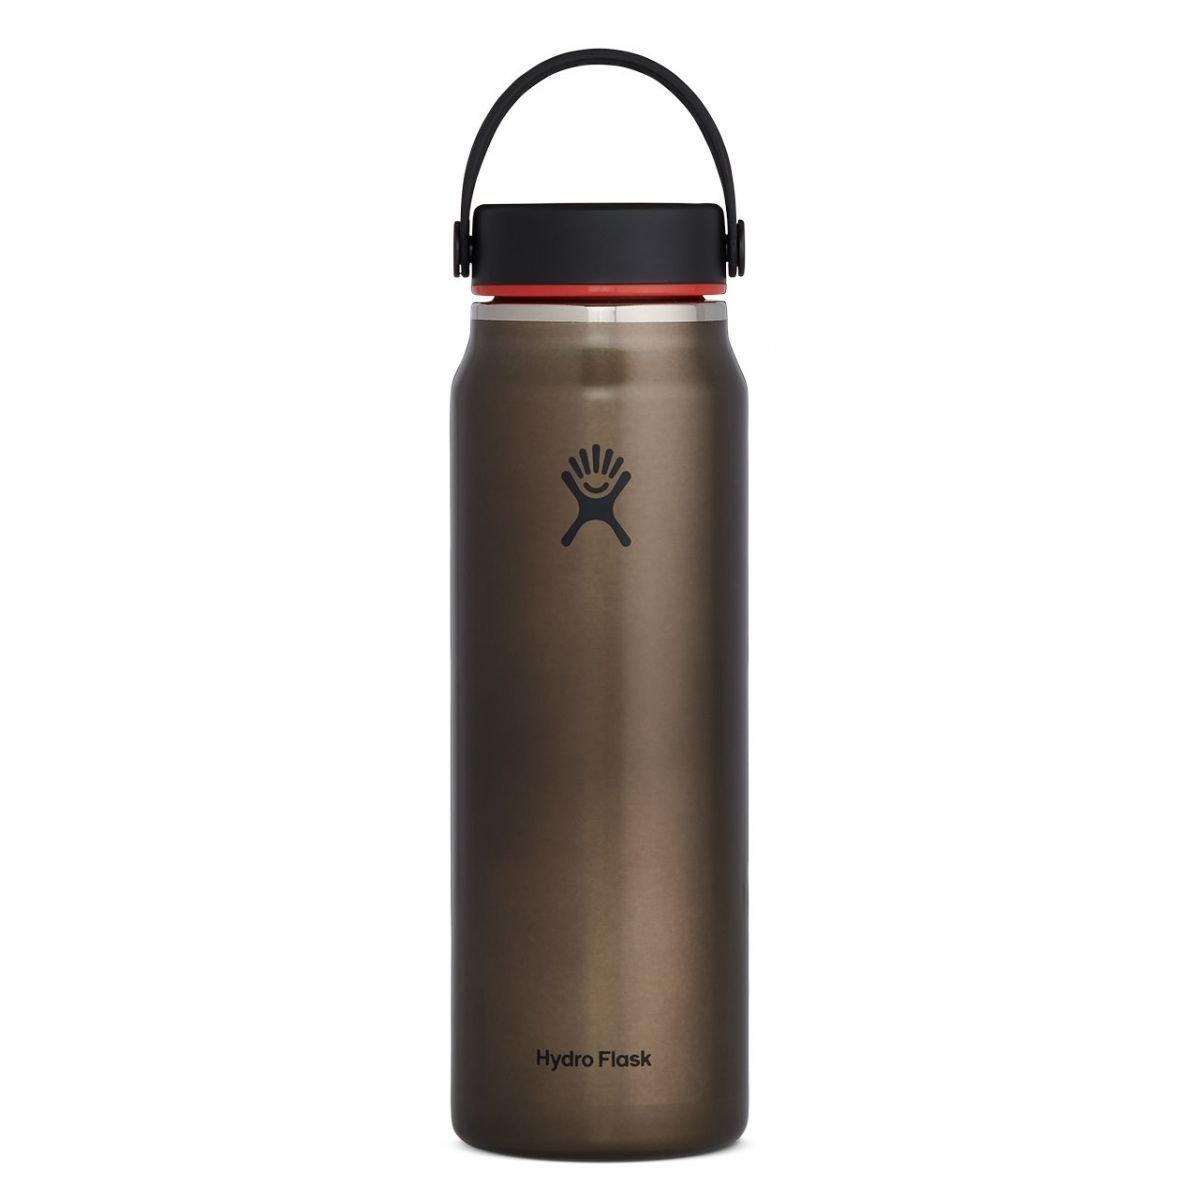 Hydroflask 32oz LW WM Trail Series